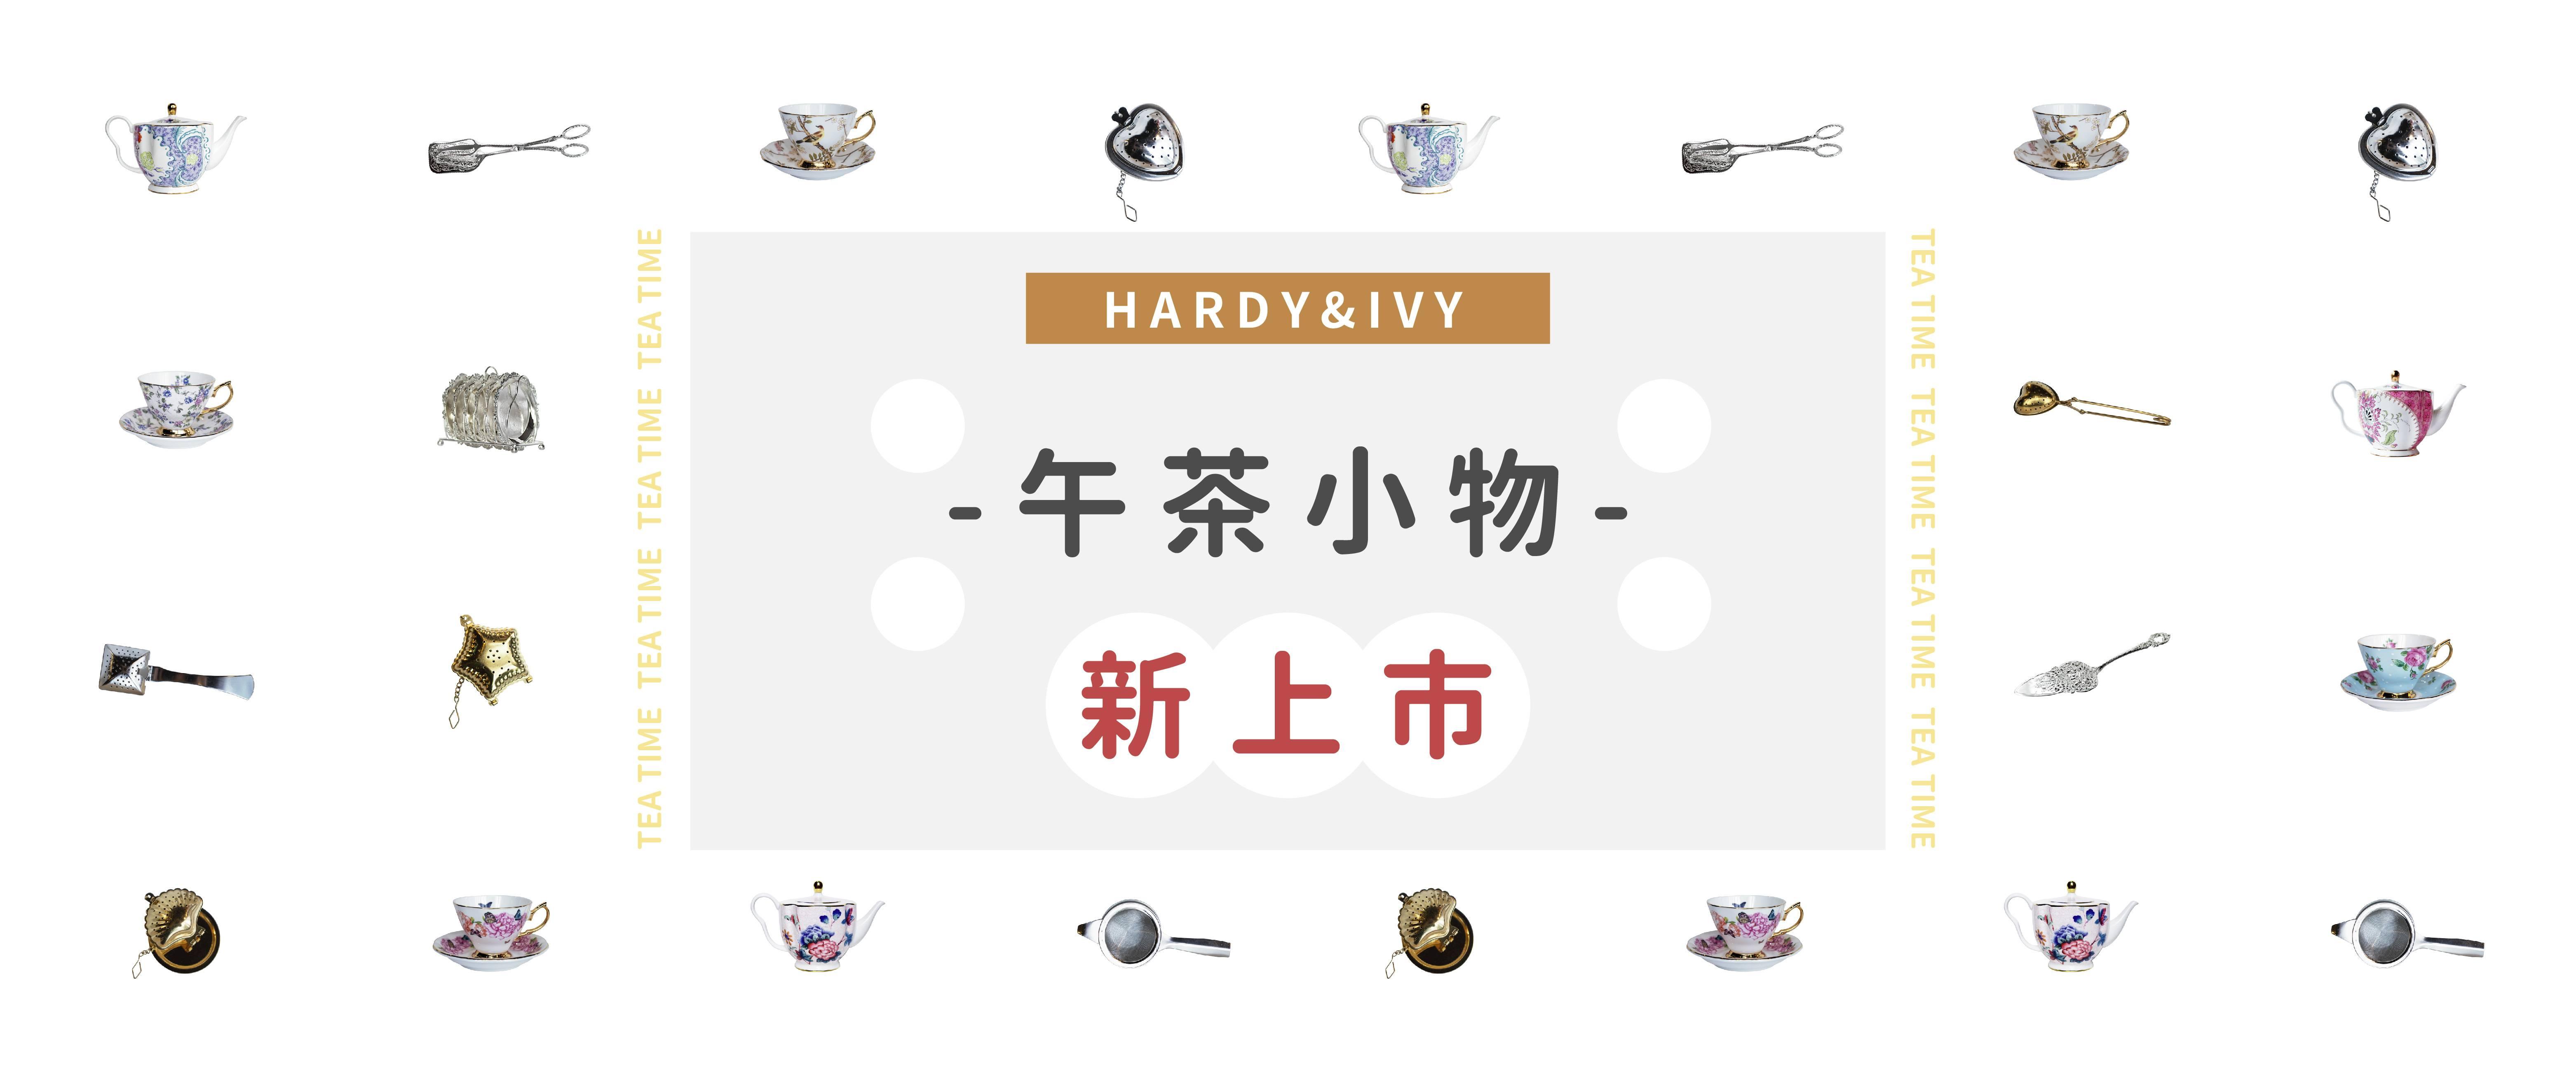 HARDY & IVY 英茶香